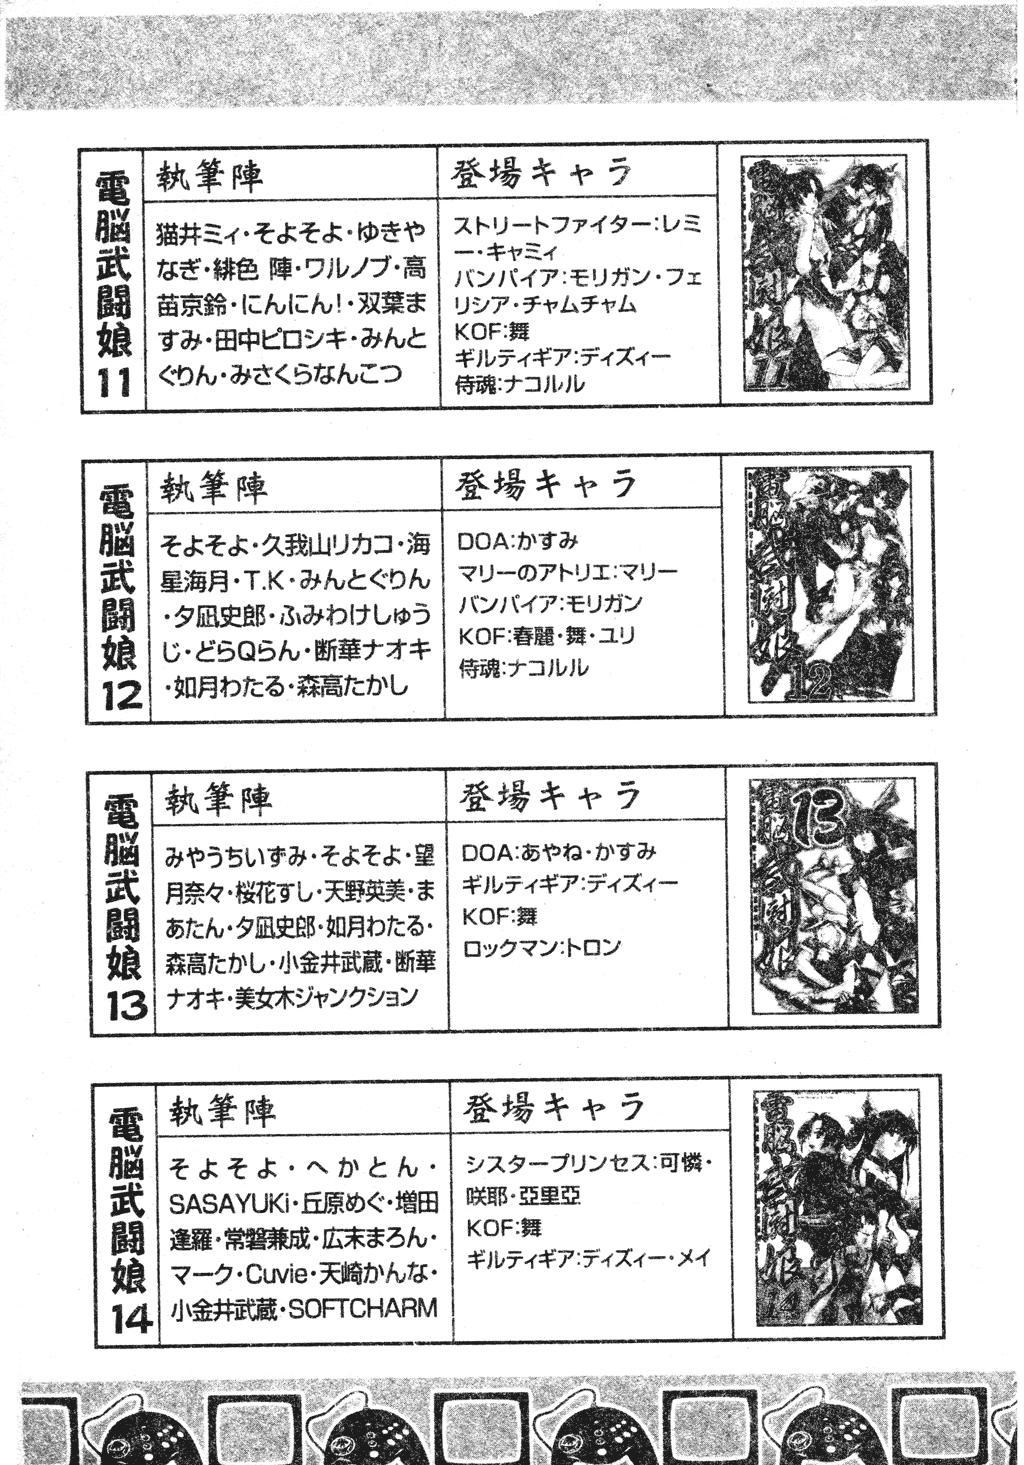 DenNow Koihime Collection 7 185